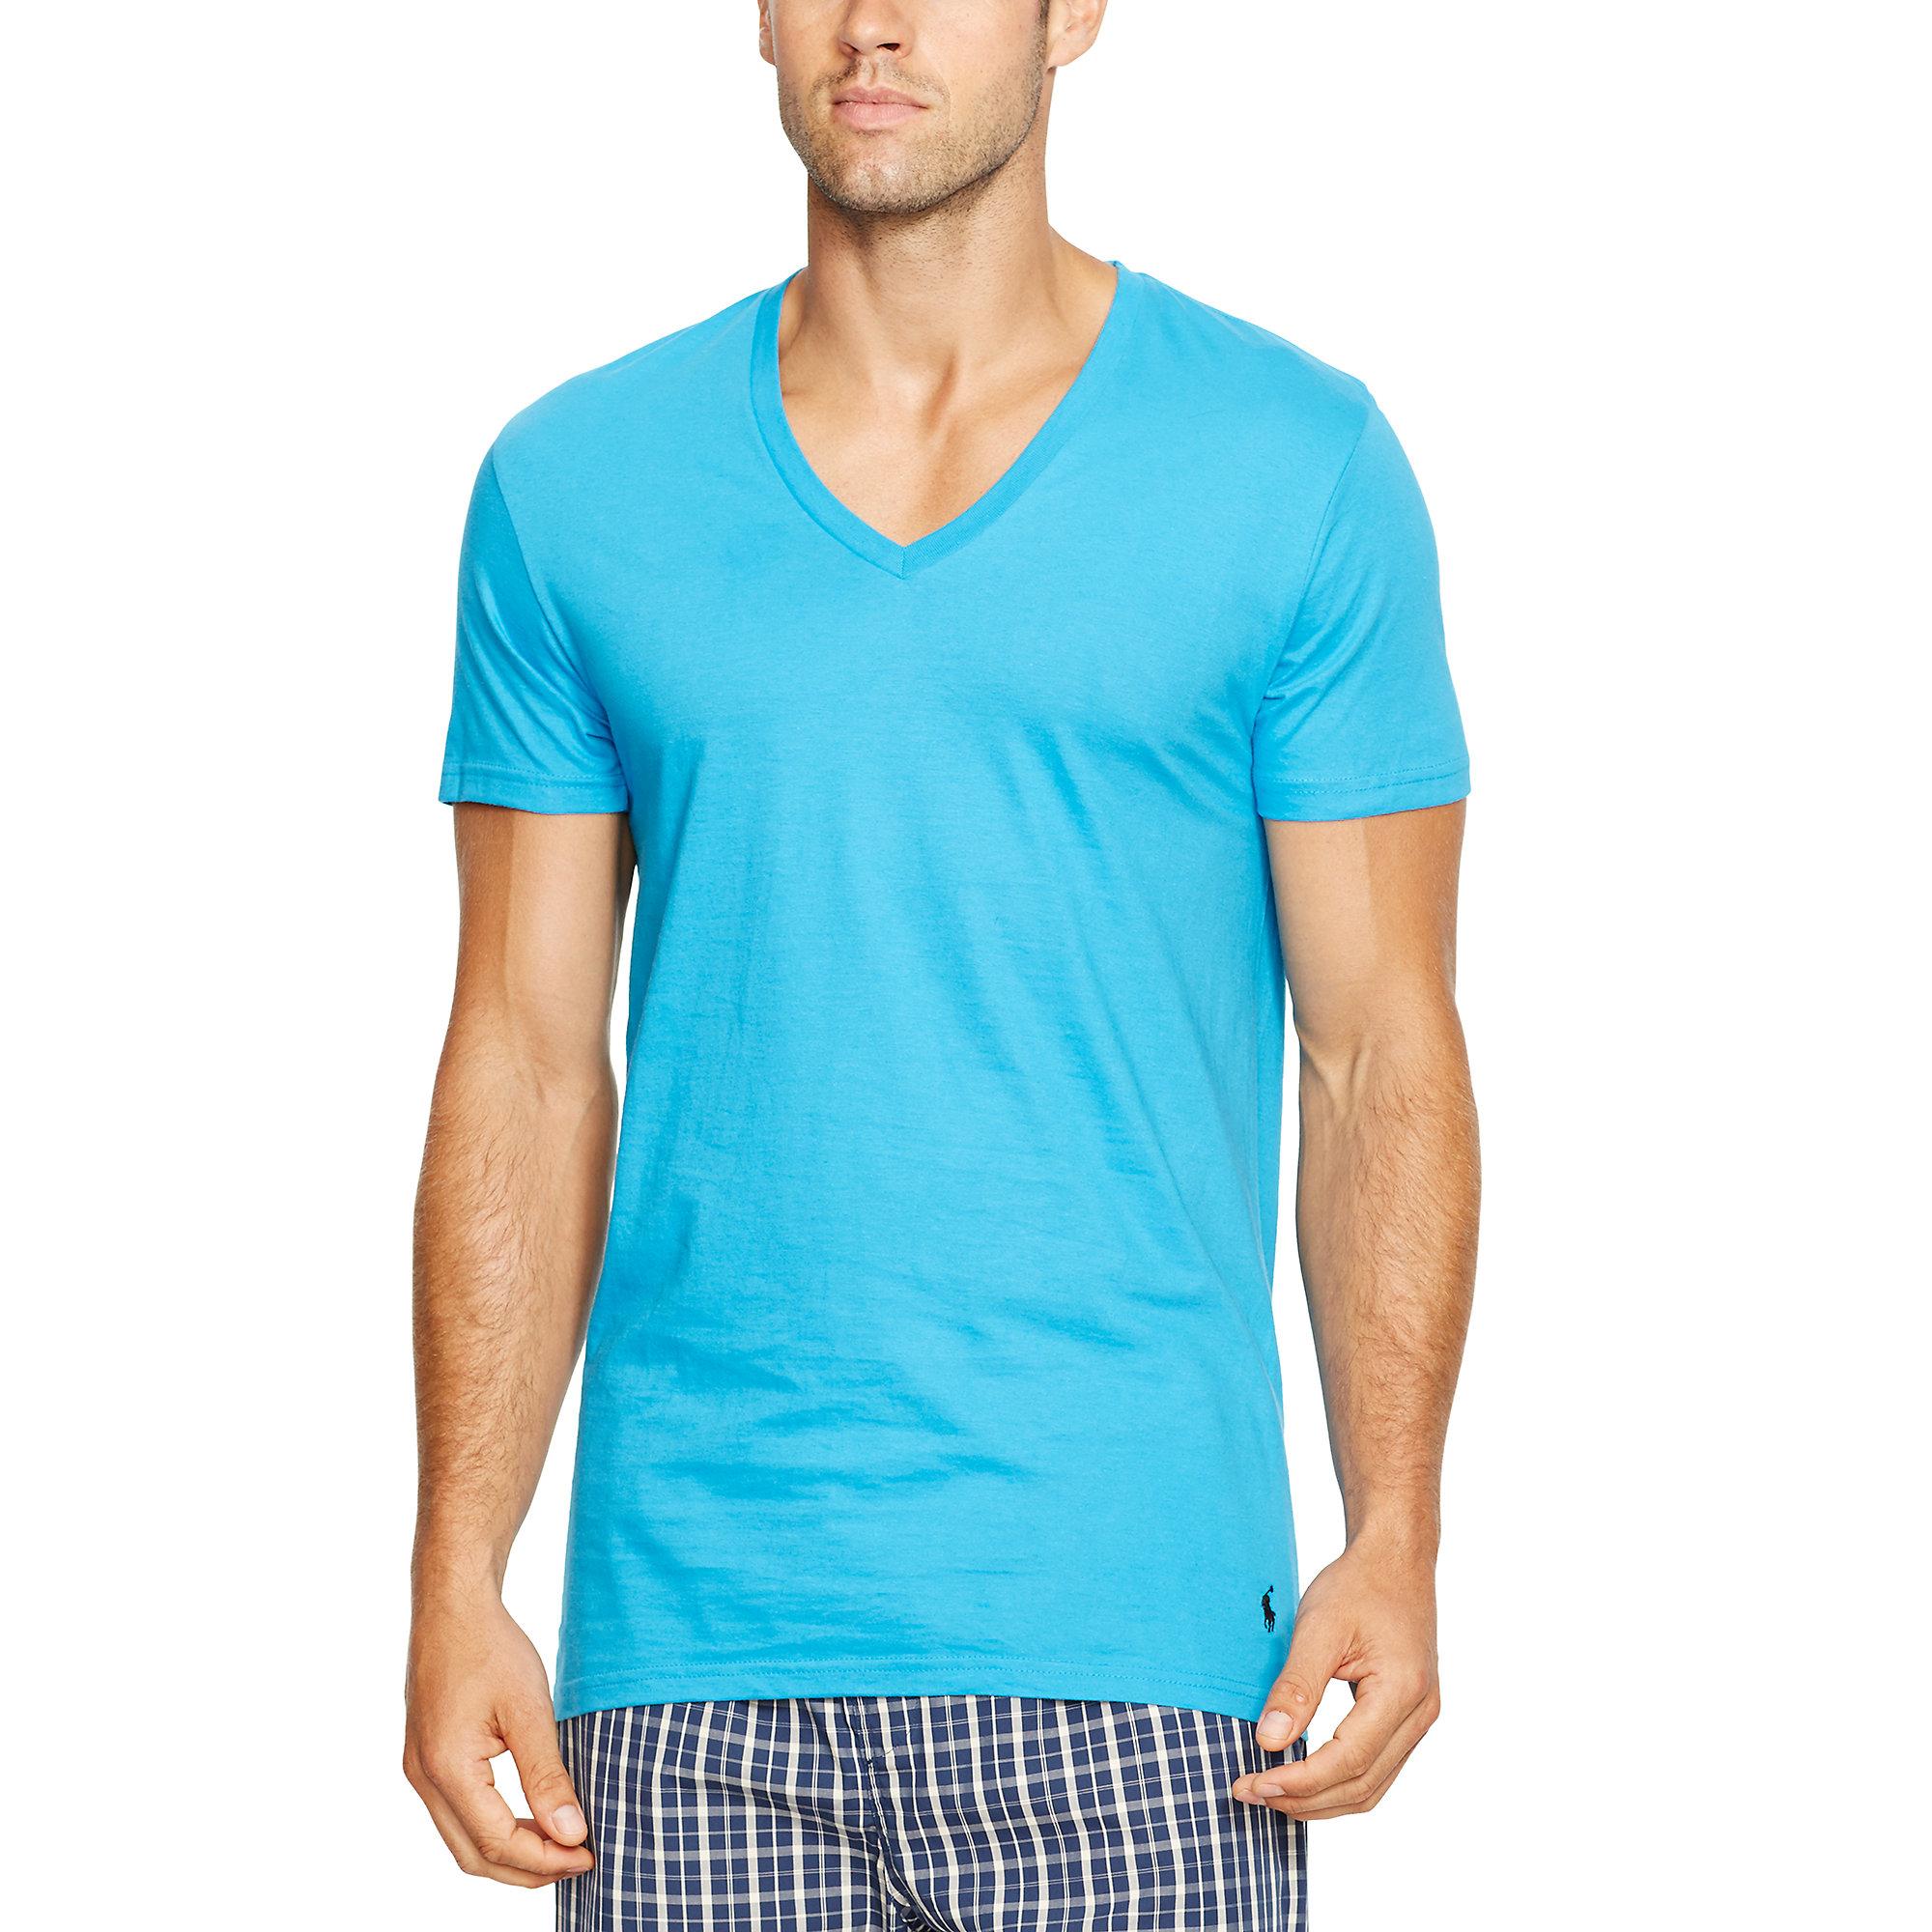 polo ralph lauren cotton v neck t shirt 3 pack in blue for men lyst. Black Bedroom Furniture Sets. Home Design Ideas